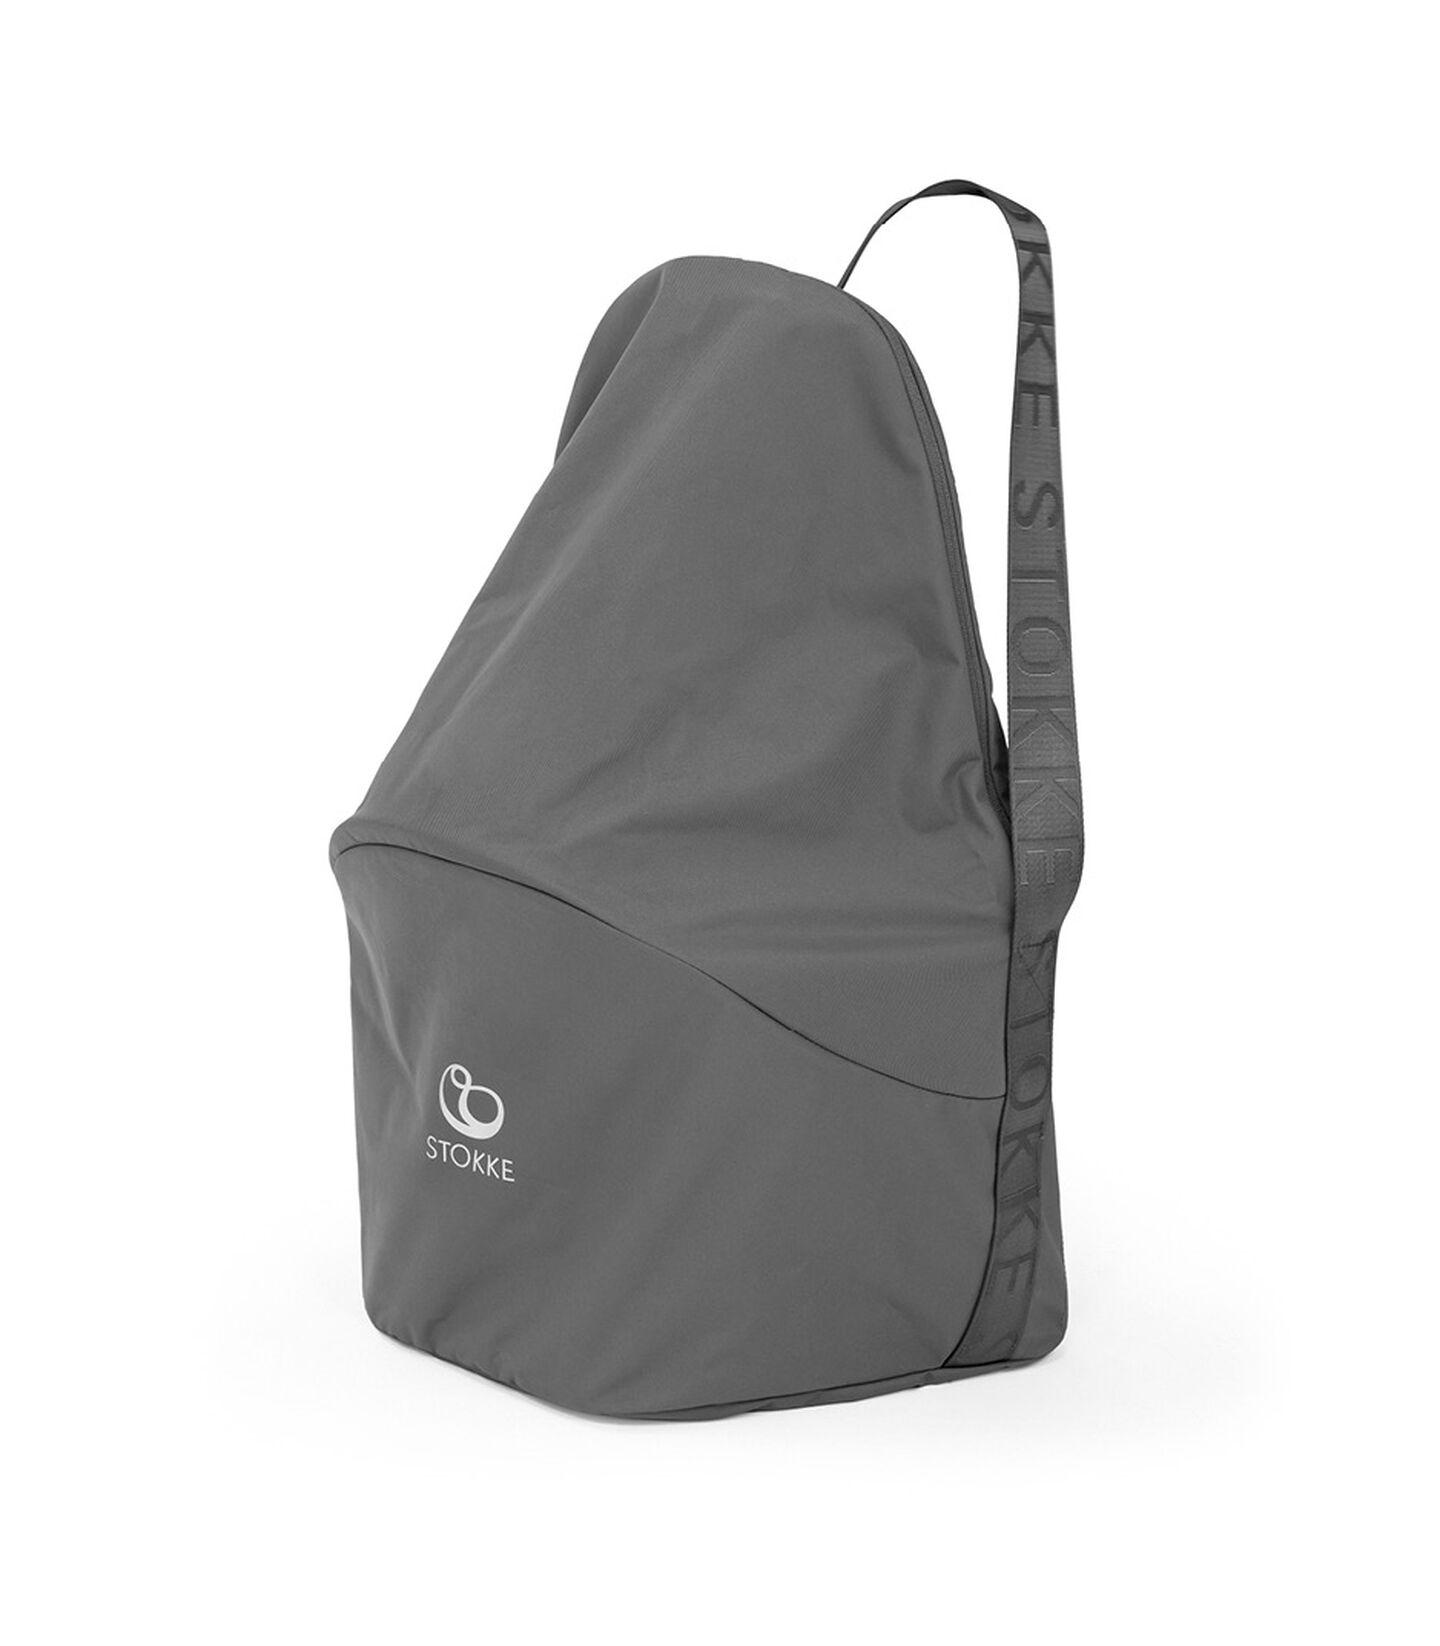 Stokke® Clikk™ Travel Bag, Dark Grey. Closed view 2